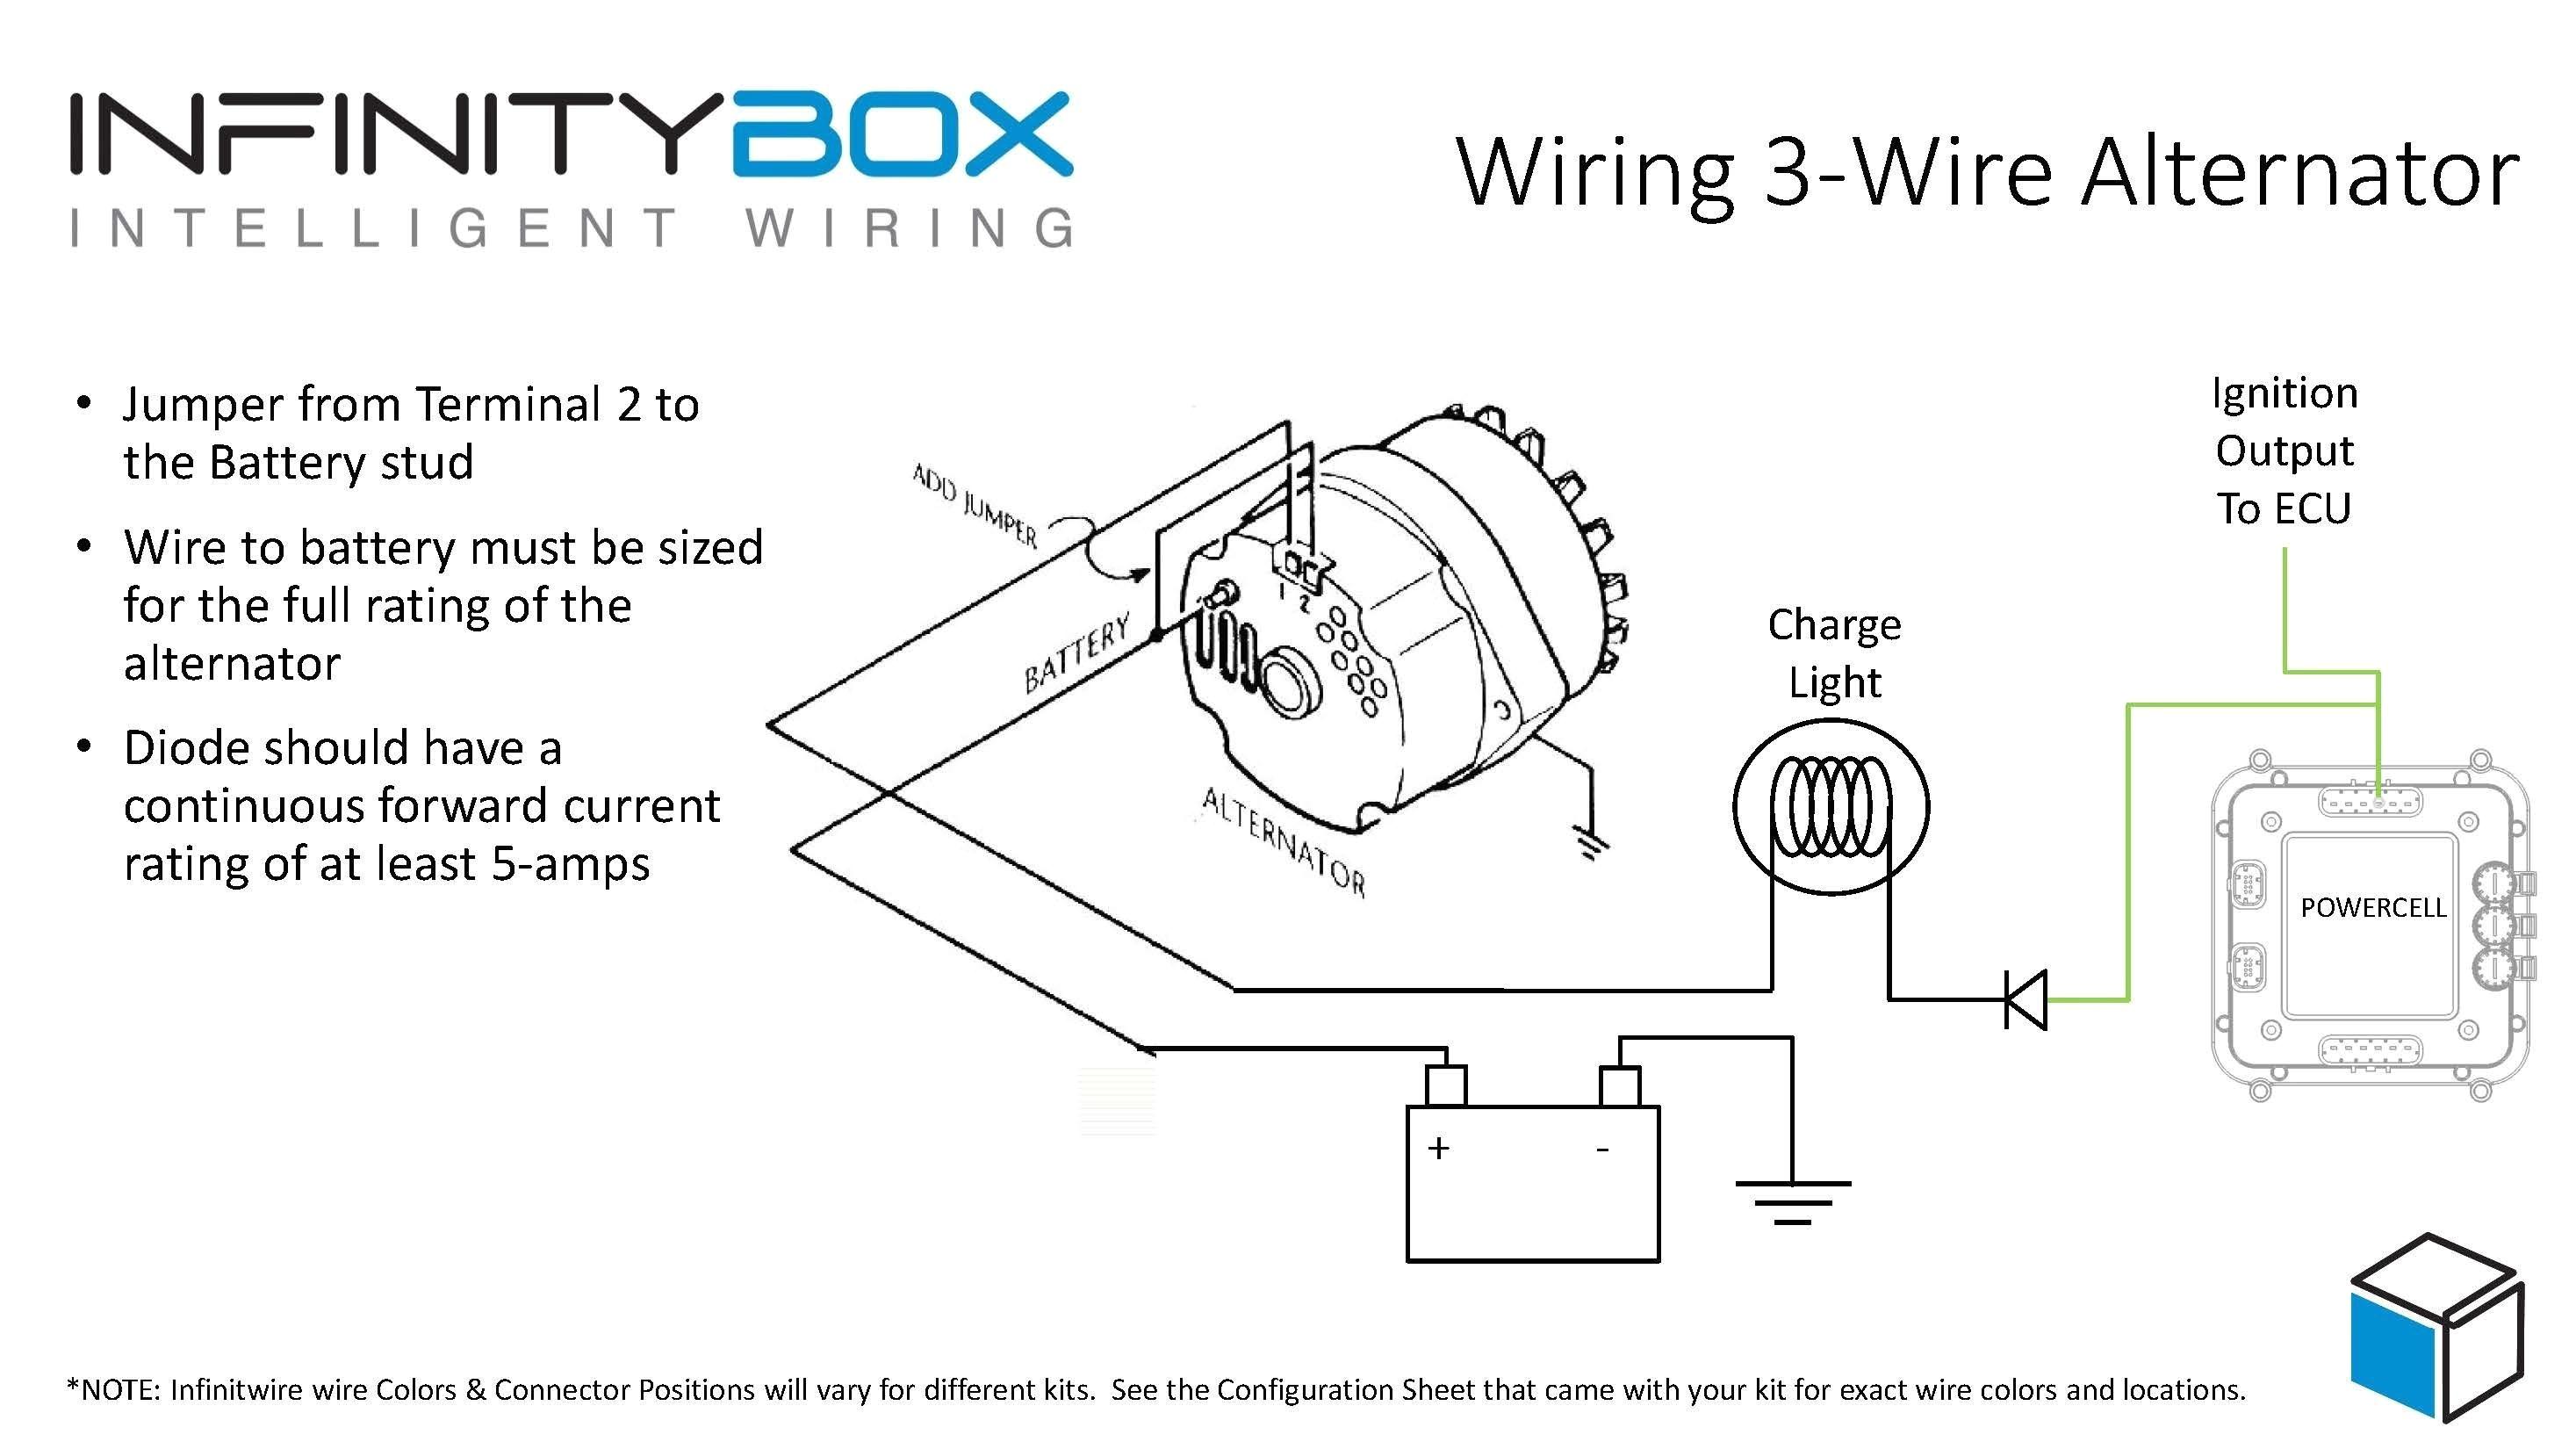 50dn alternator diagram use wiring diagram fiat ducato alternator wiring diagram